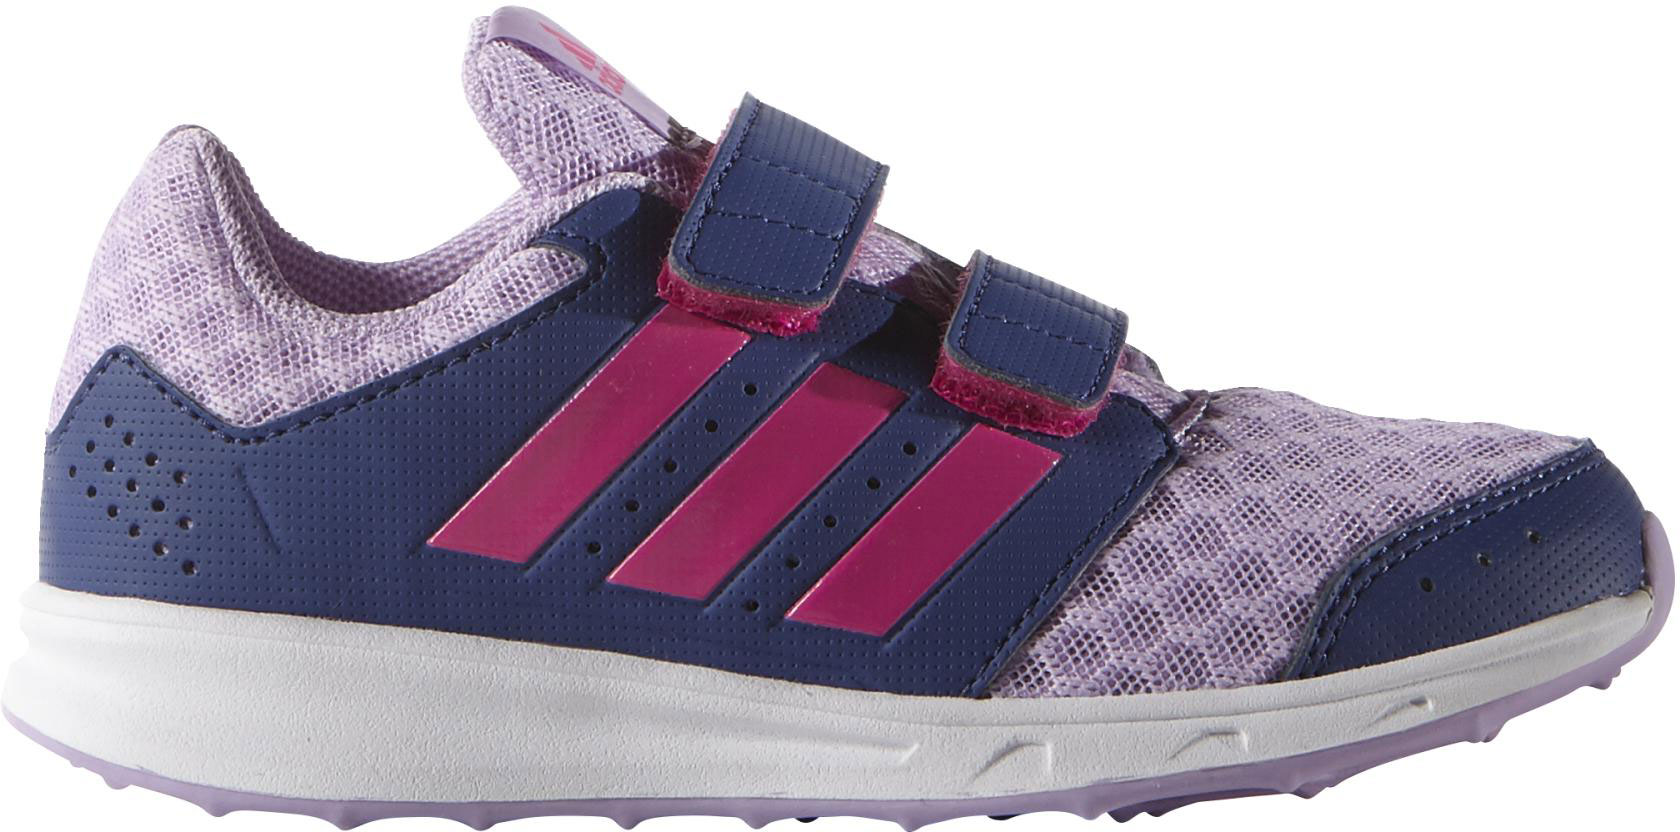 Adidas Kinder Schuhe Sneaker Turnschuhe IK Sport 2 cf k , Gr: 24, 34, NEU | eBay